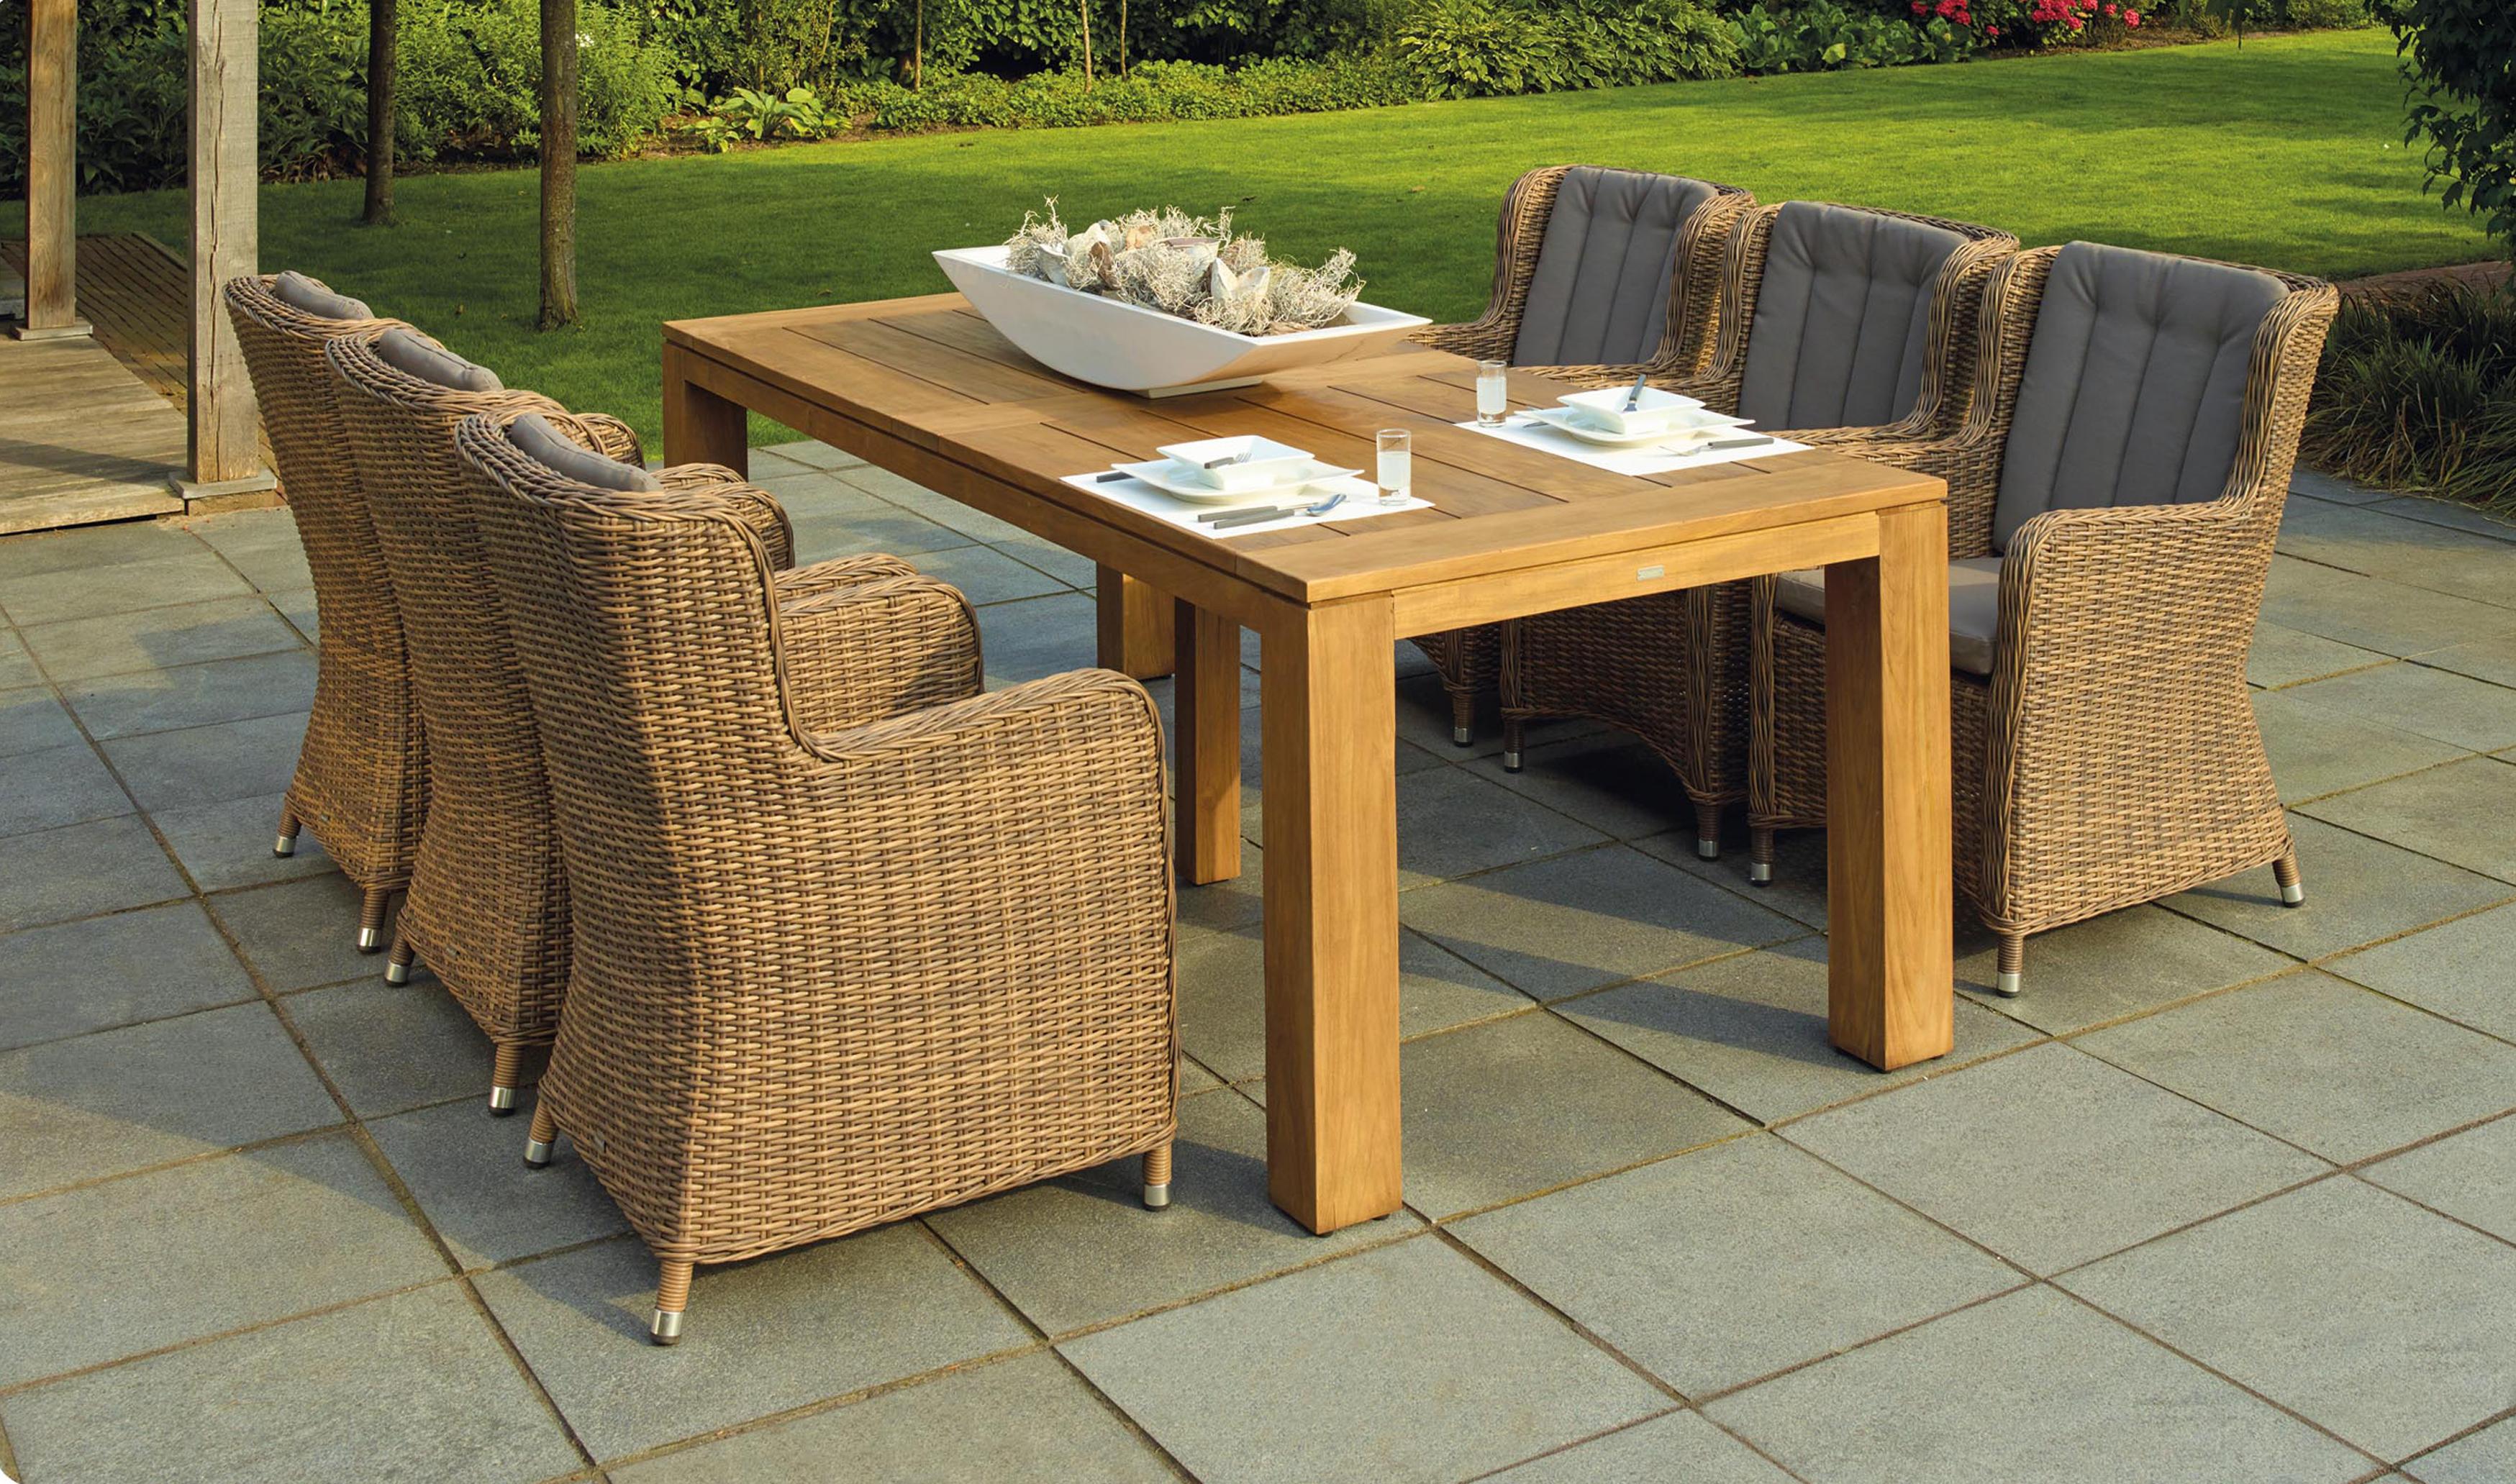 outdoor furniture wicker furniture photo credit - Garden Furniture King